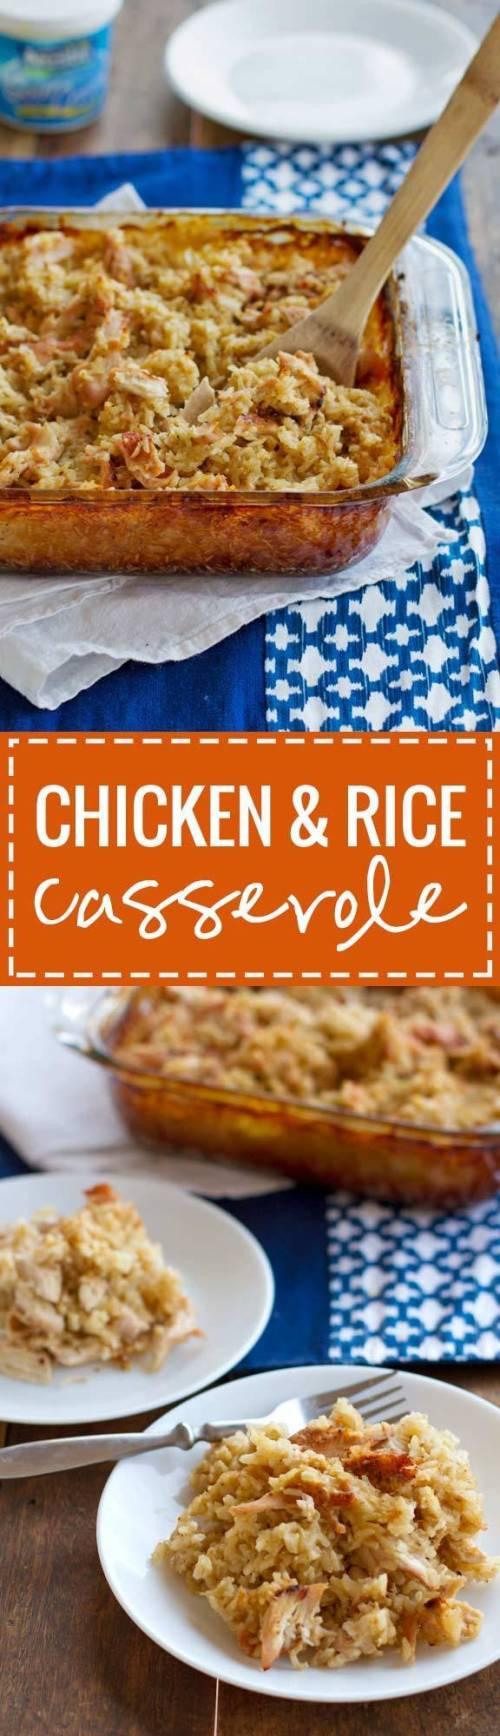 Medium Of Campbells Chicken And Rice Casserole